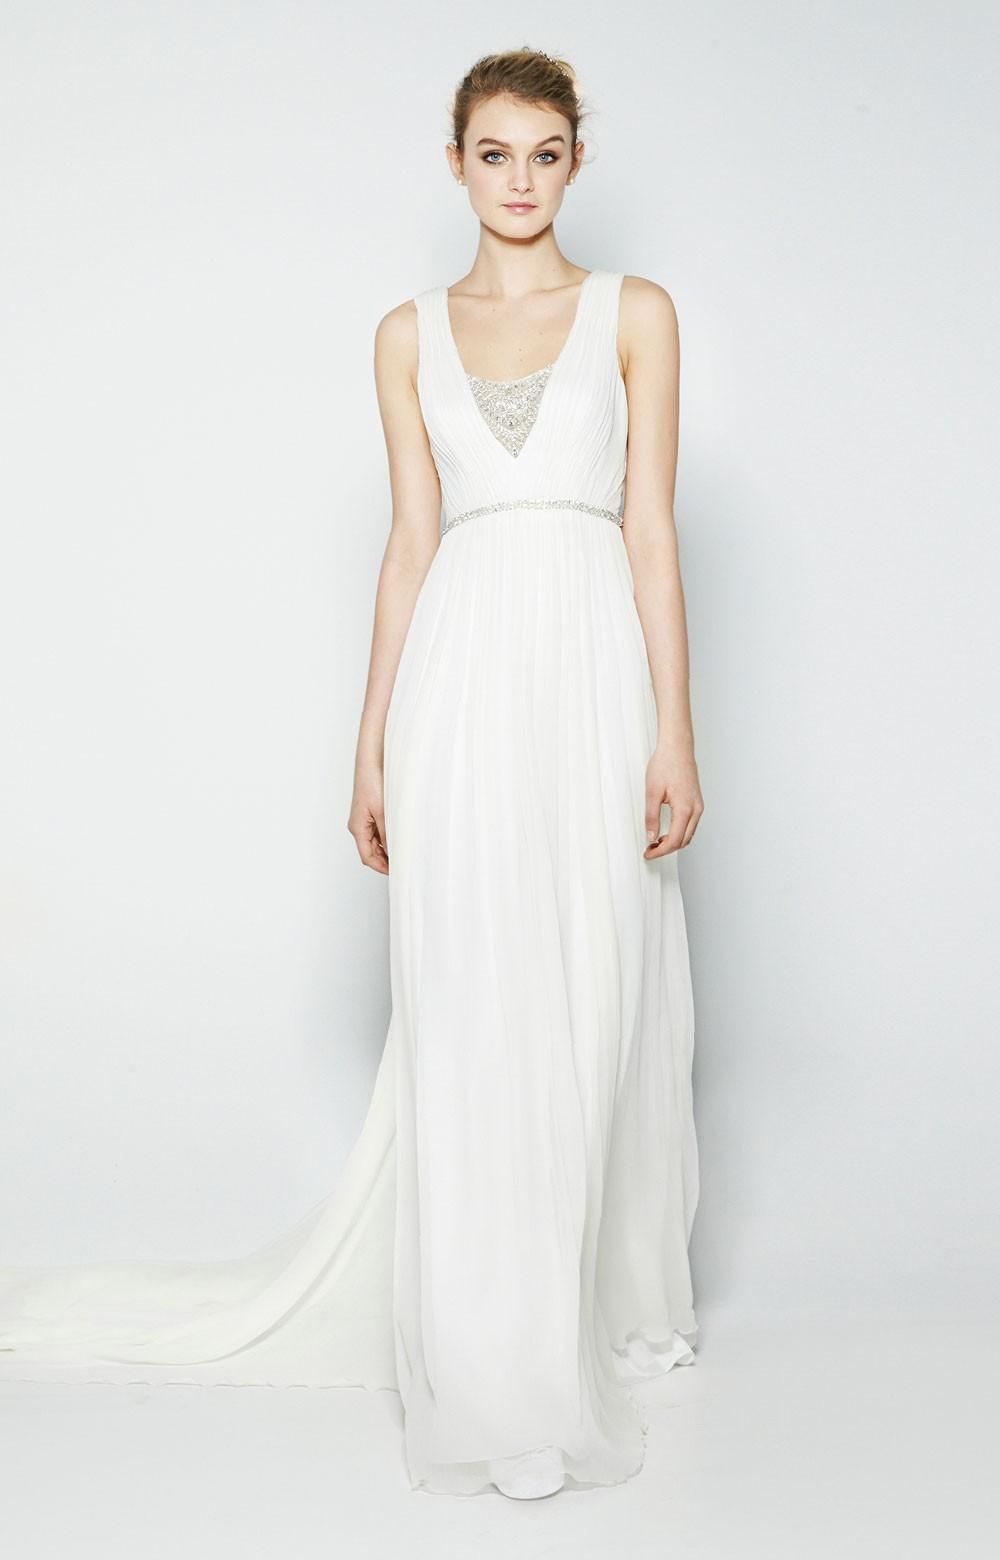 Nicole Miller The Dress Bridal